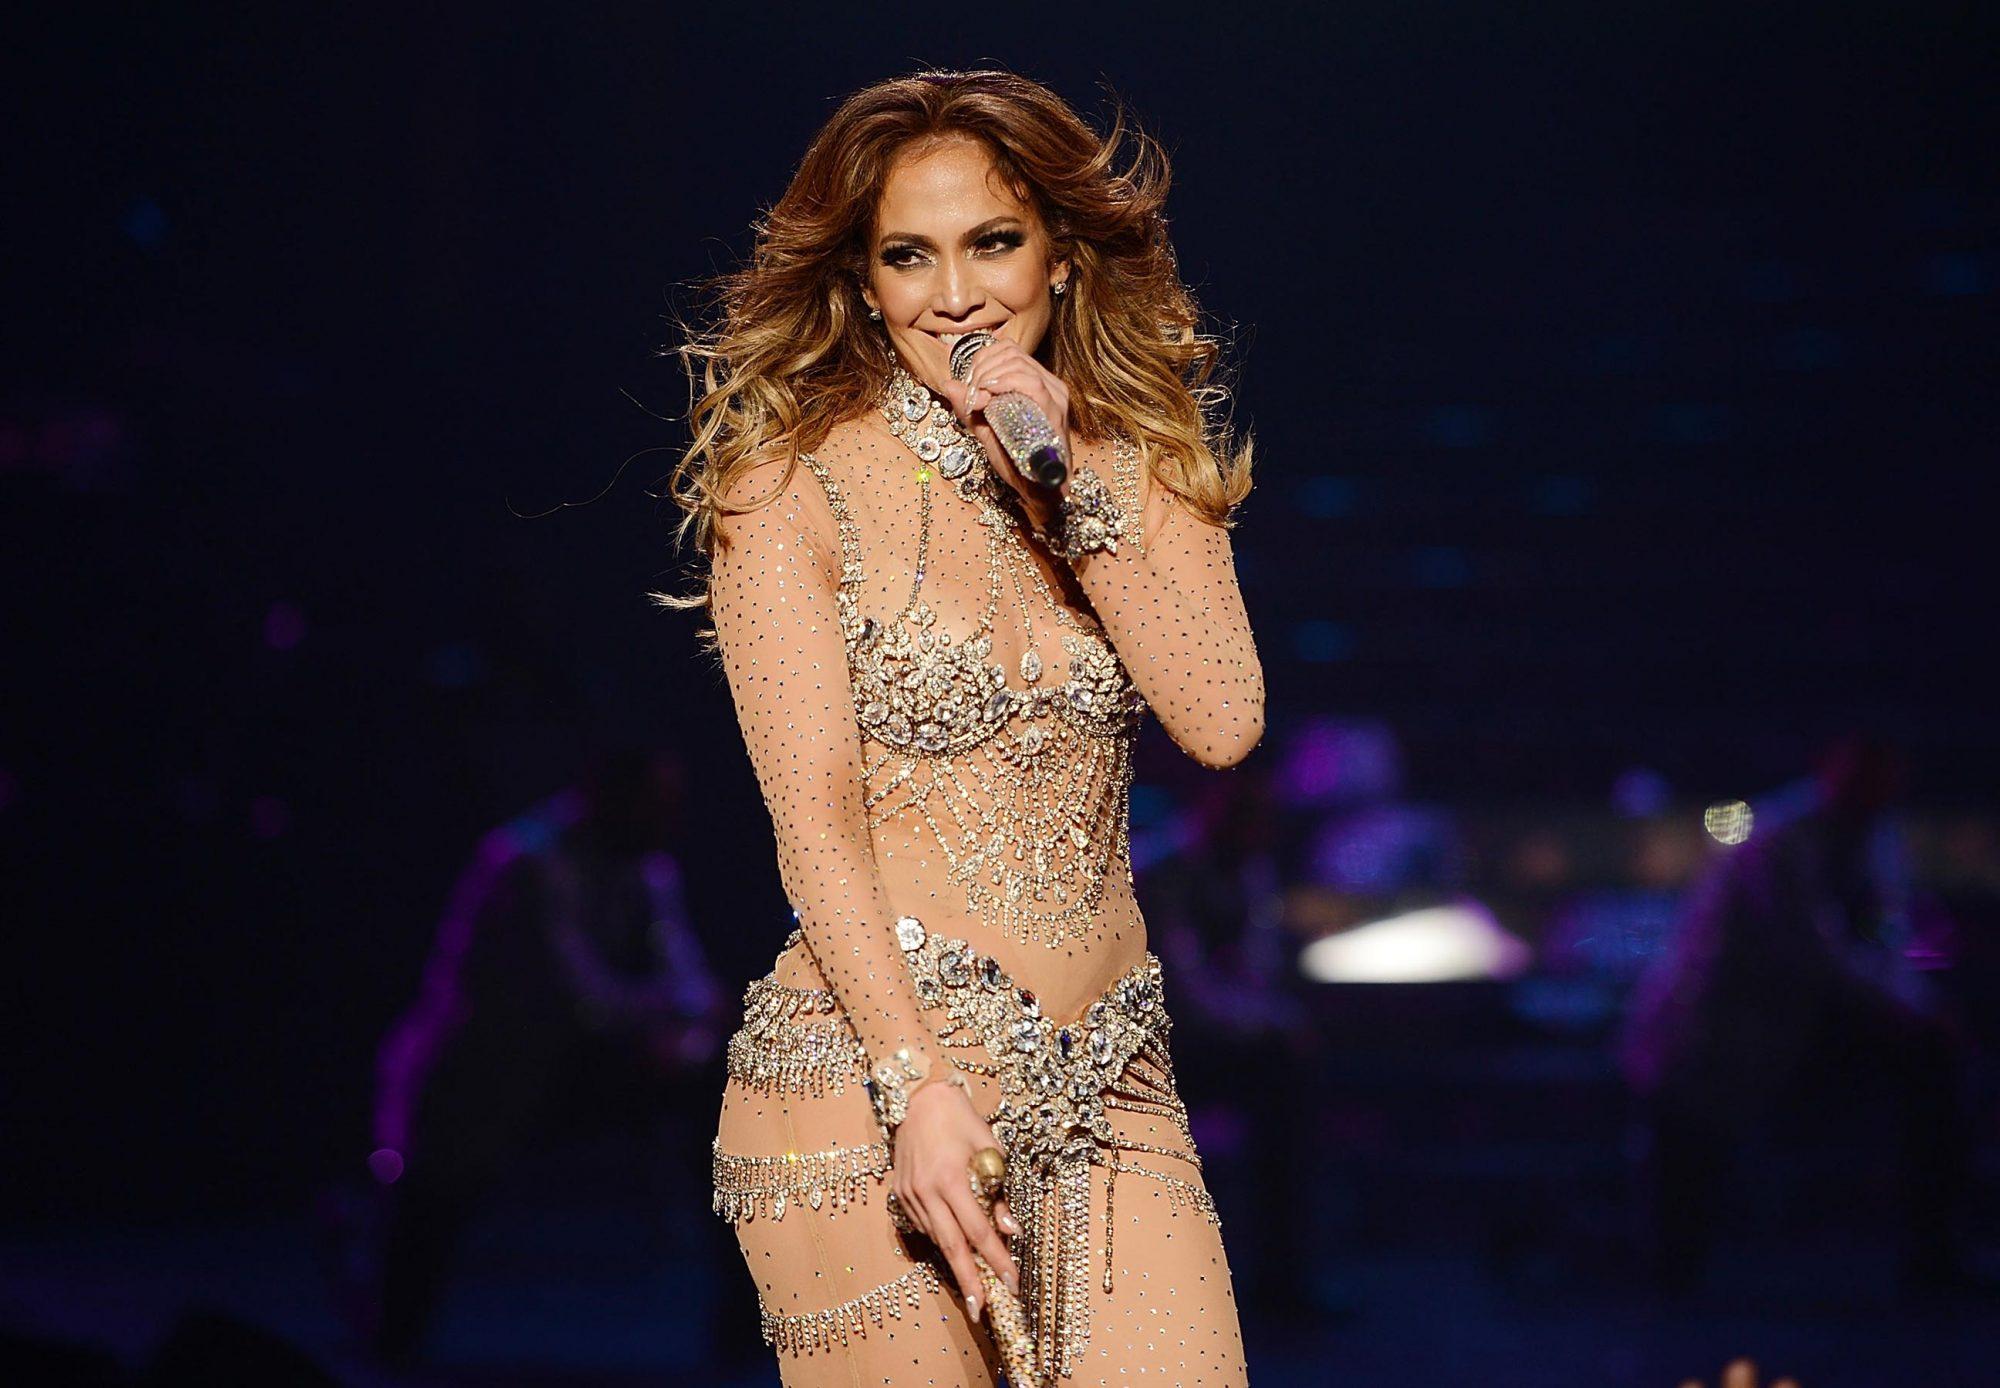 Jennifer Lopez Debuts Her New Headlining Residency Show JENNIFER LOPEZ: ALL I HAVE at Planet Hollywood Resort & Casino